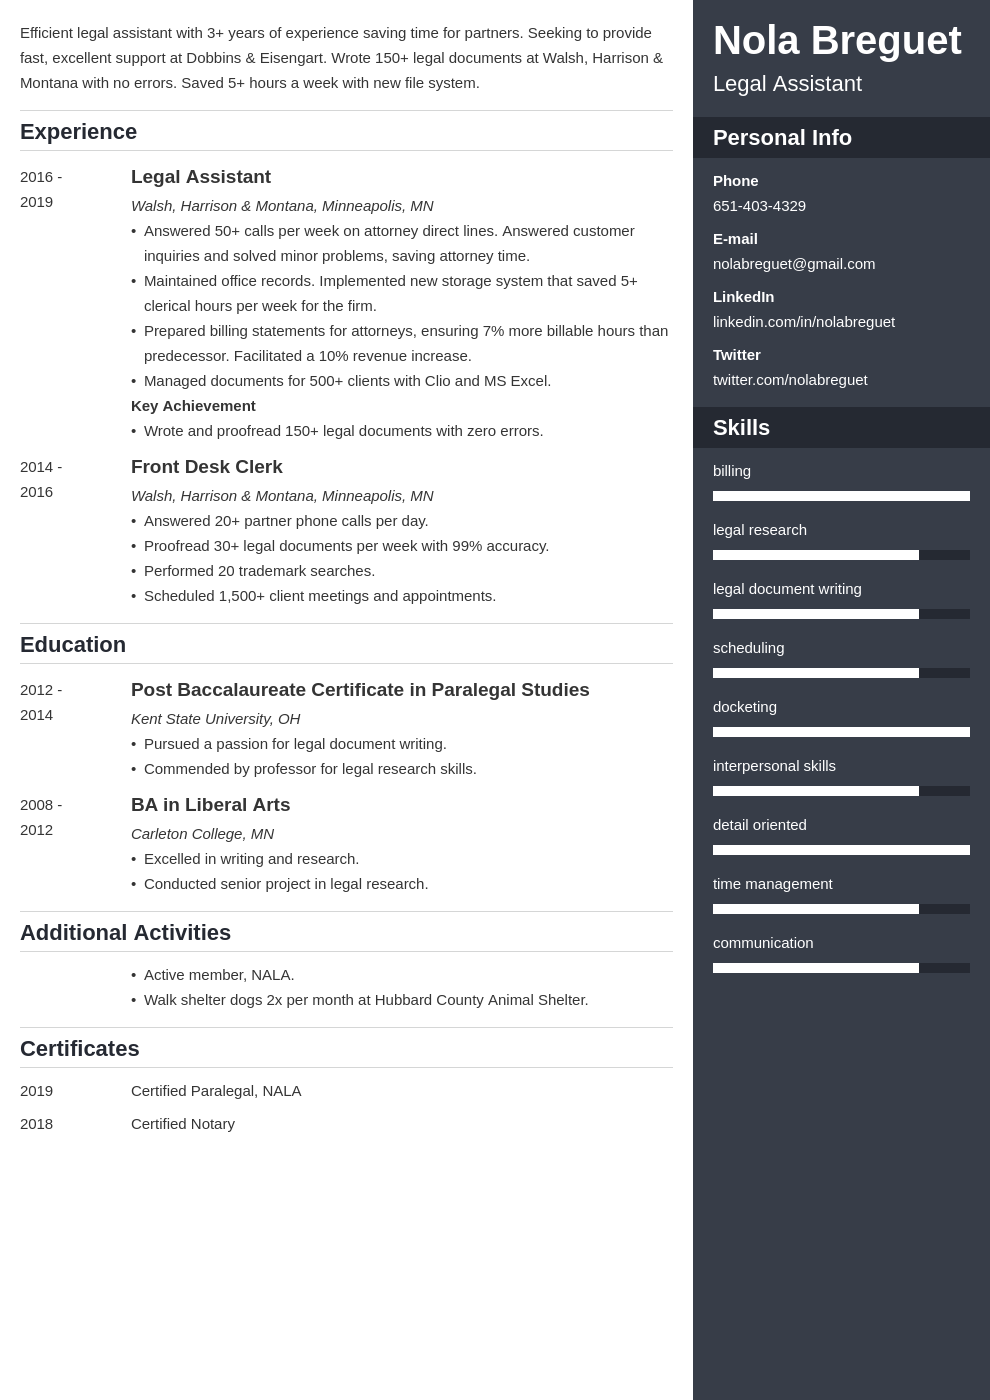 legal assistant template enfold uk